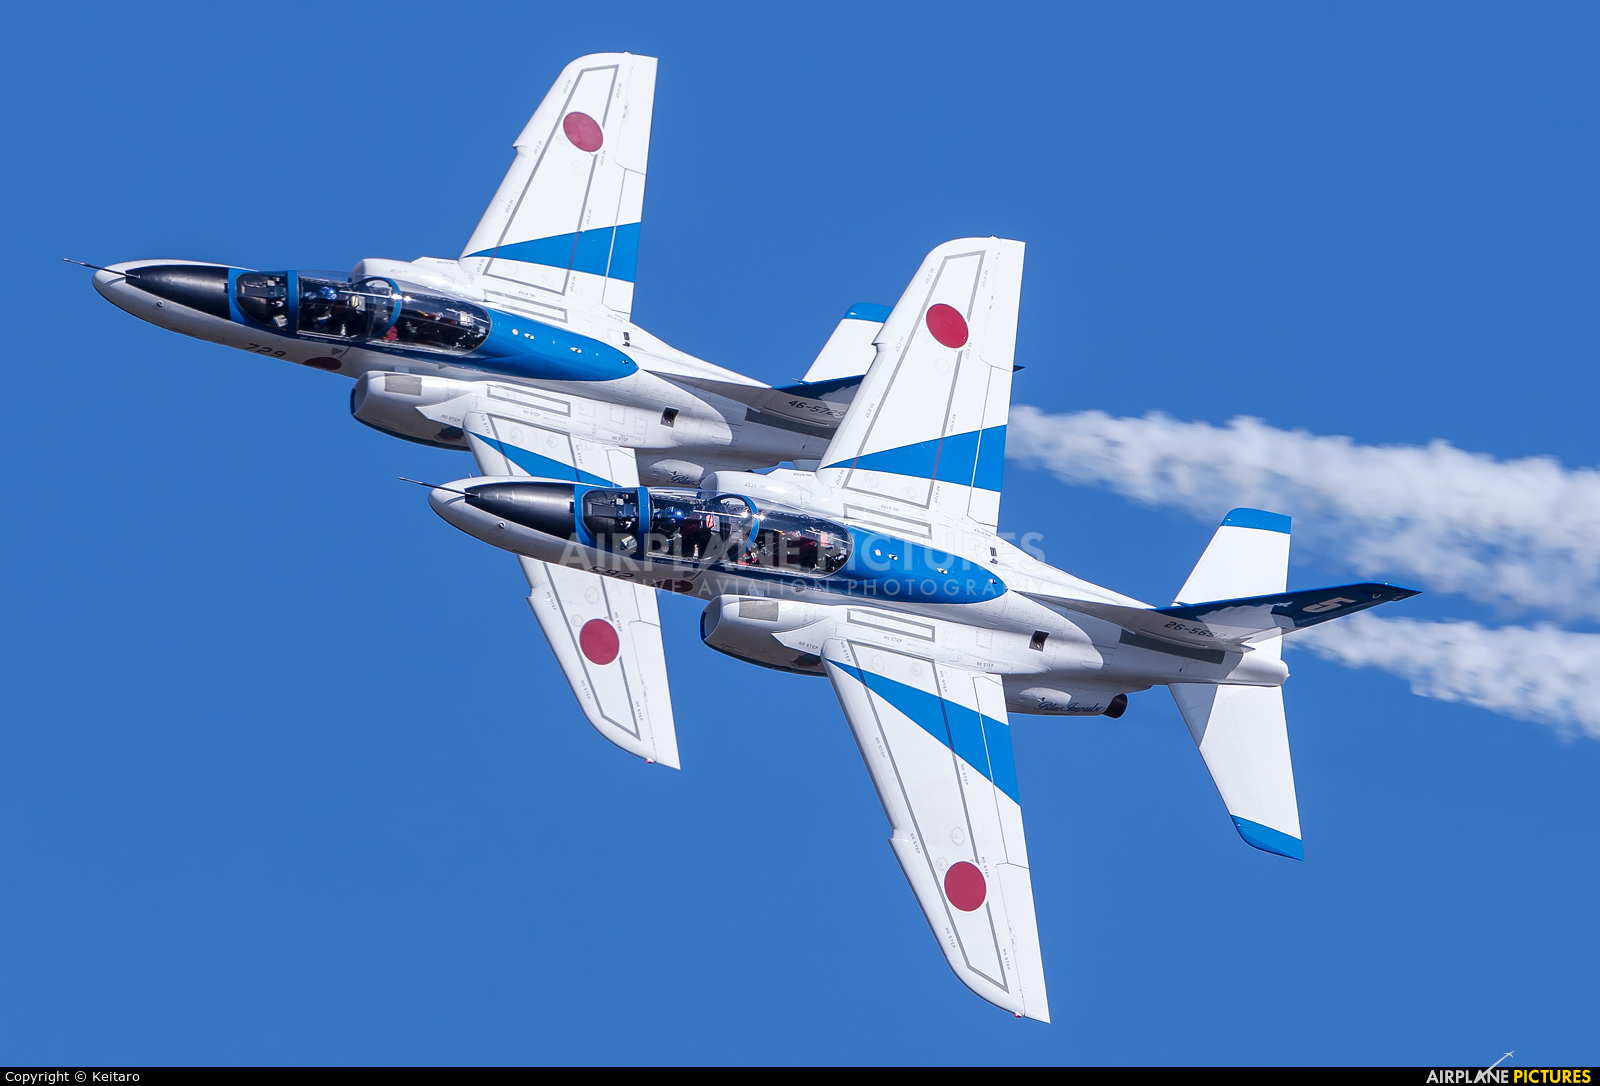 Japan - ASDF: Blue Impulse 26-5692 aircraft at Iruma AB